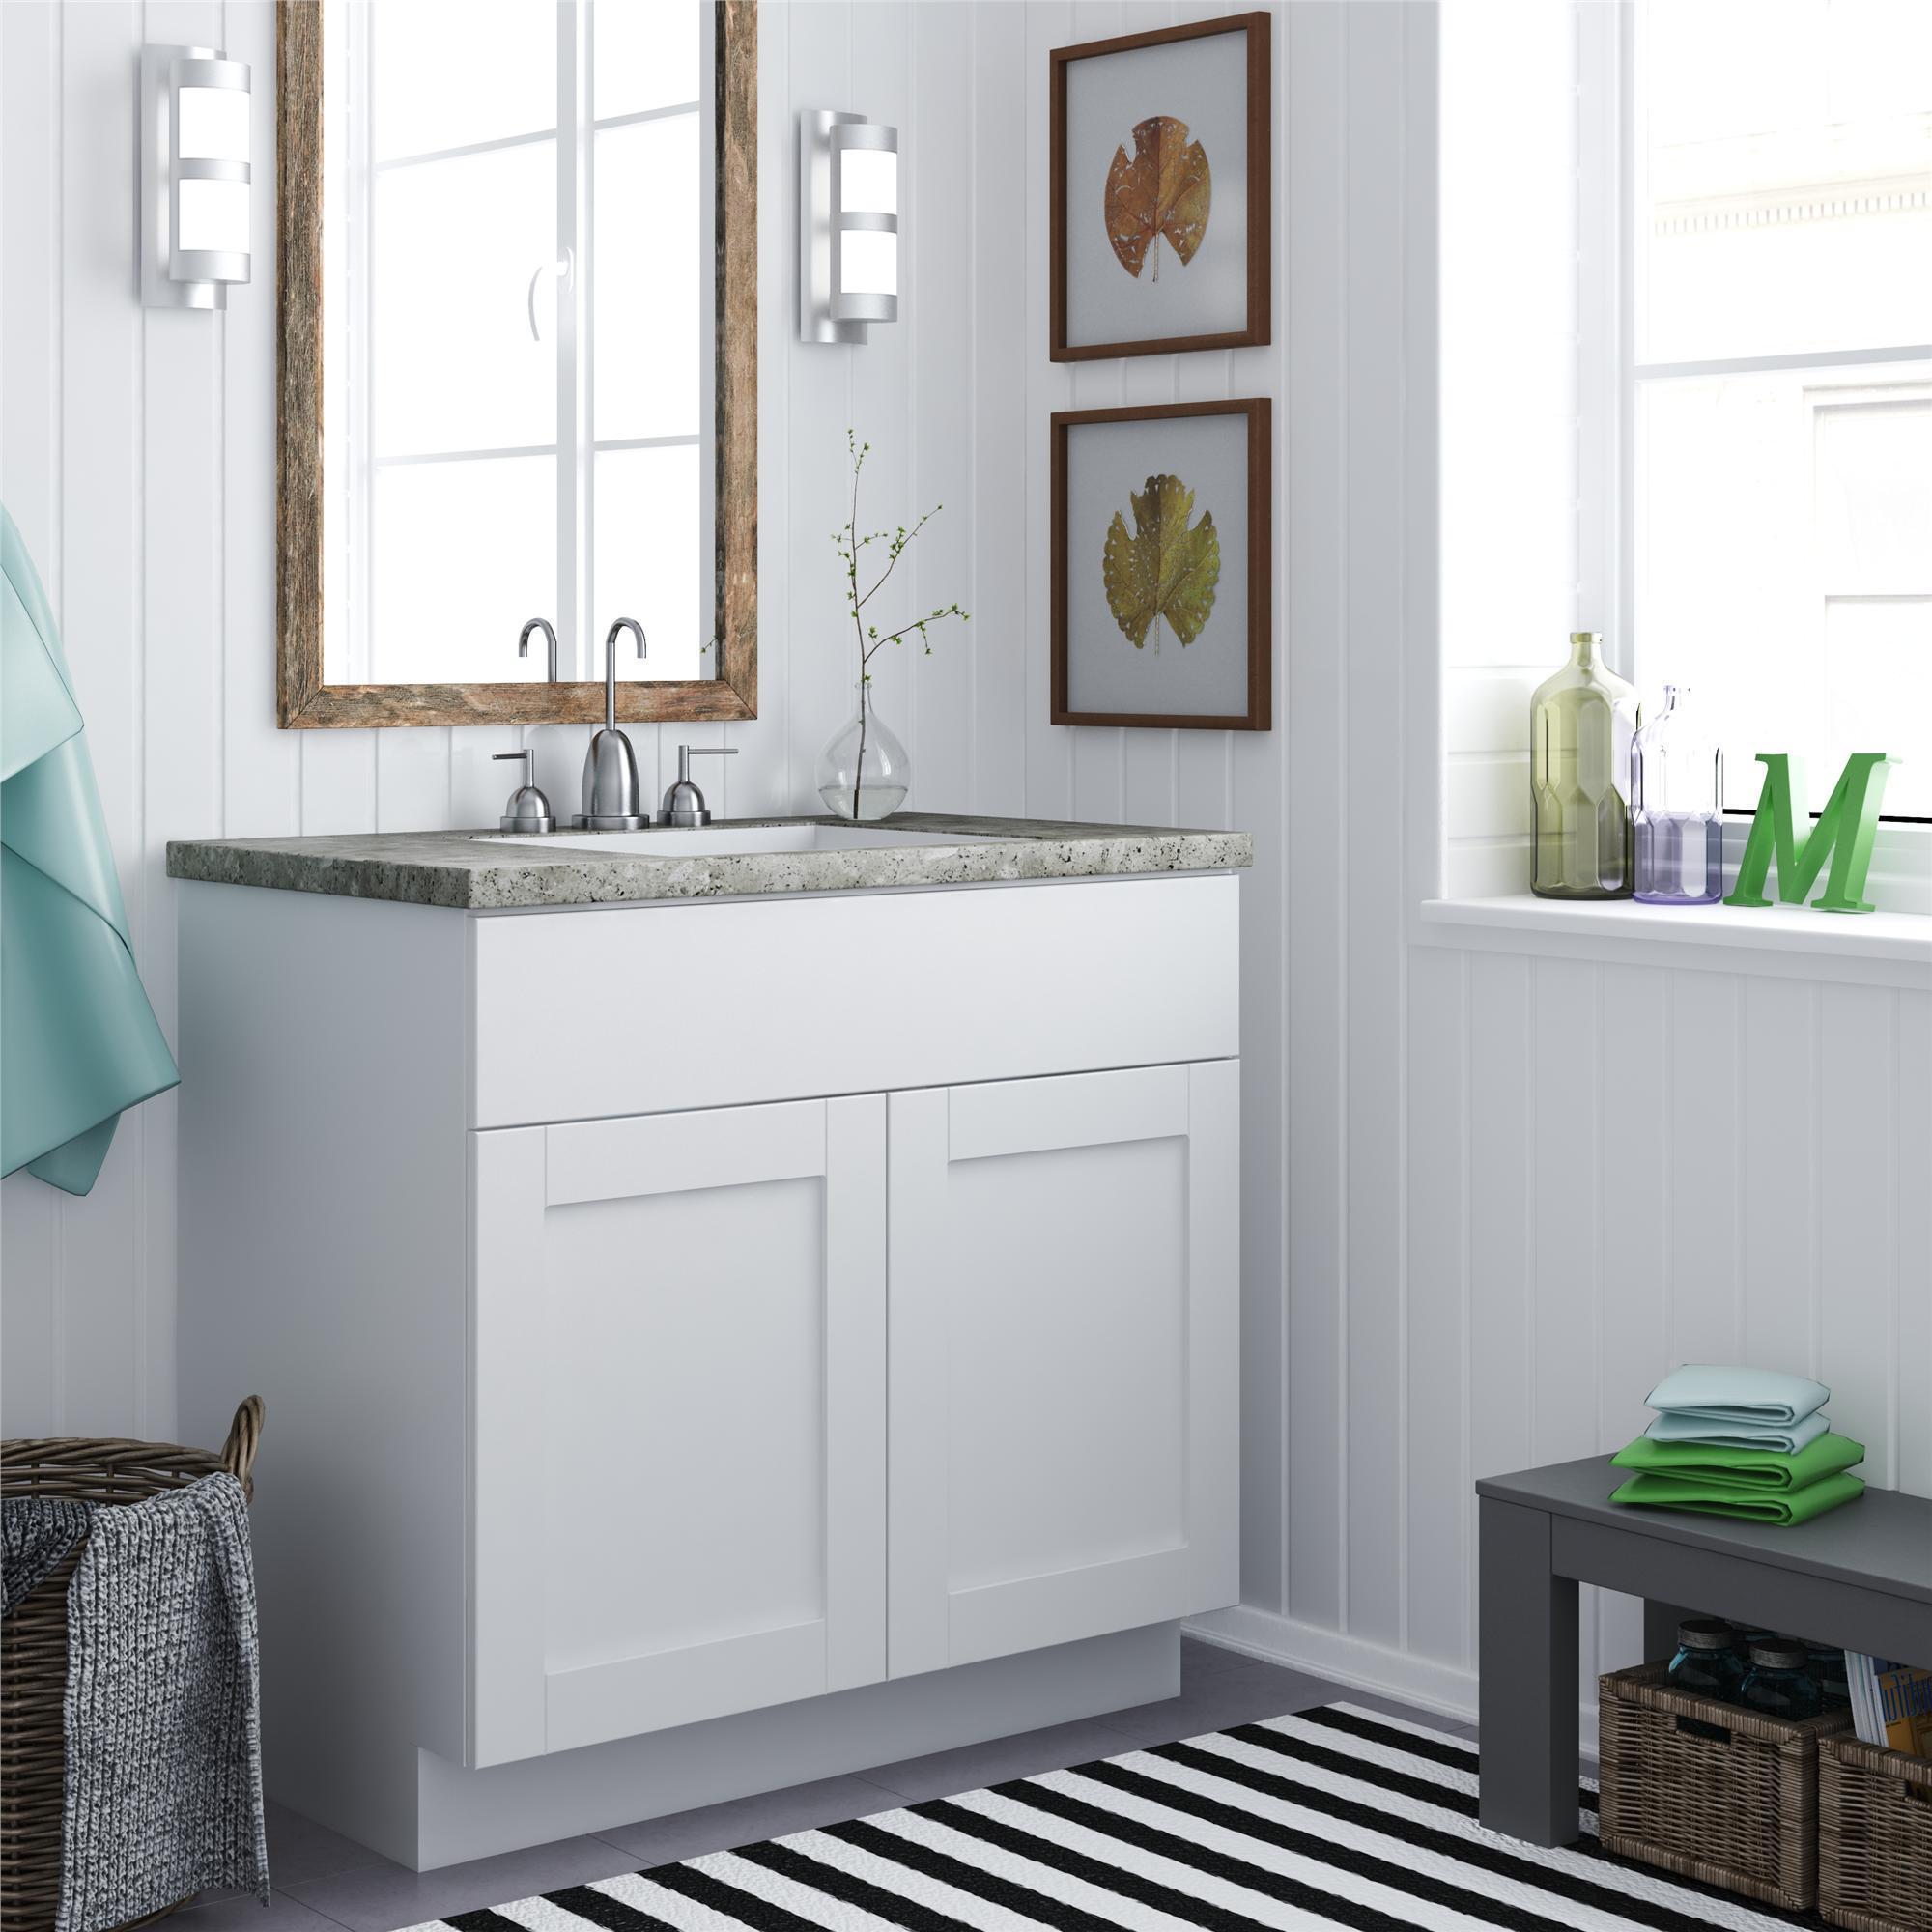 White Shaker Style Bath Vanity Cabinet